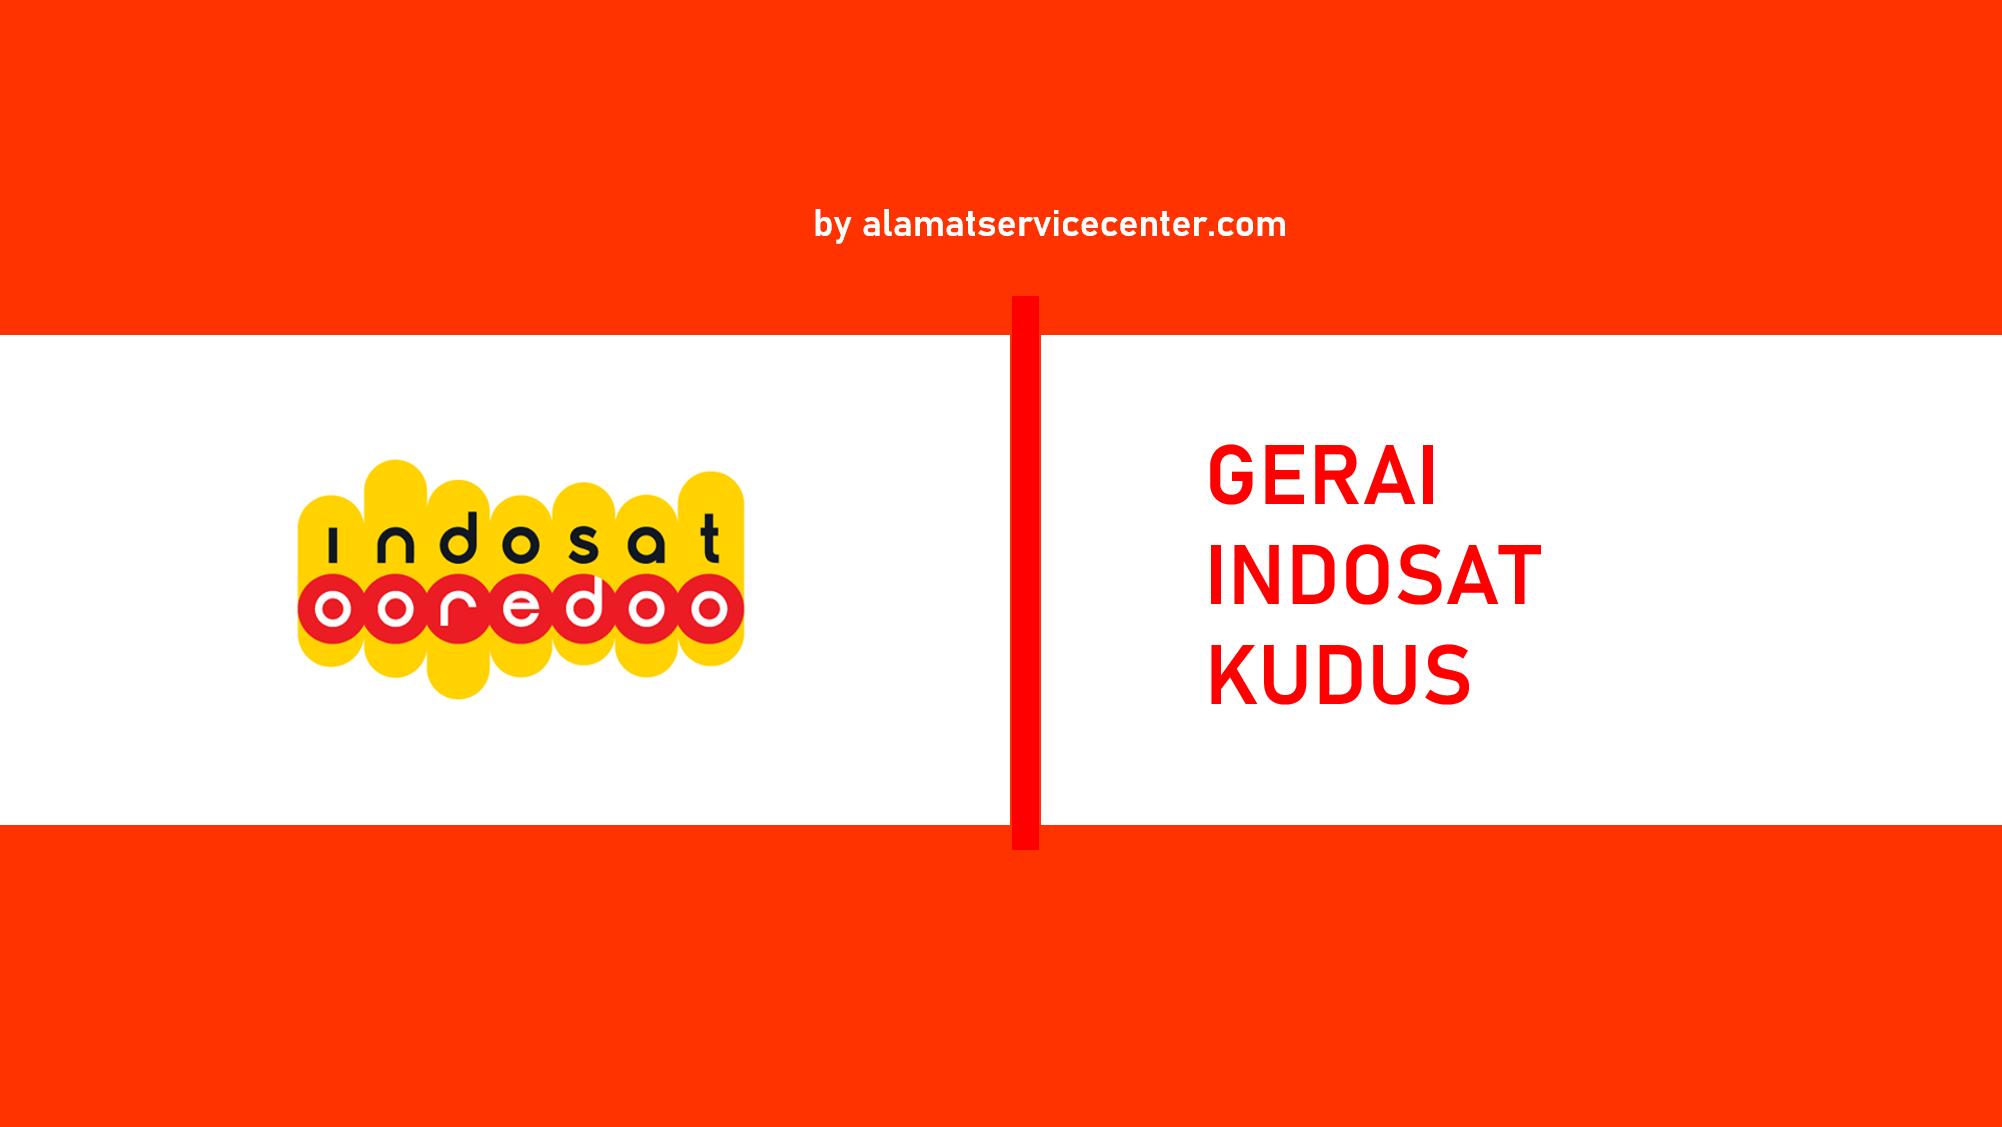 Gerai Indosat Kudus